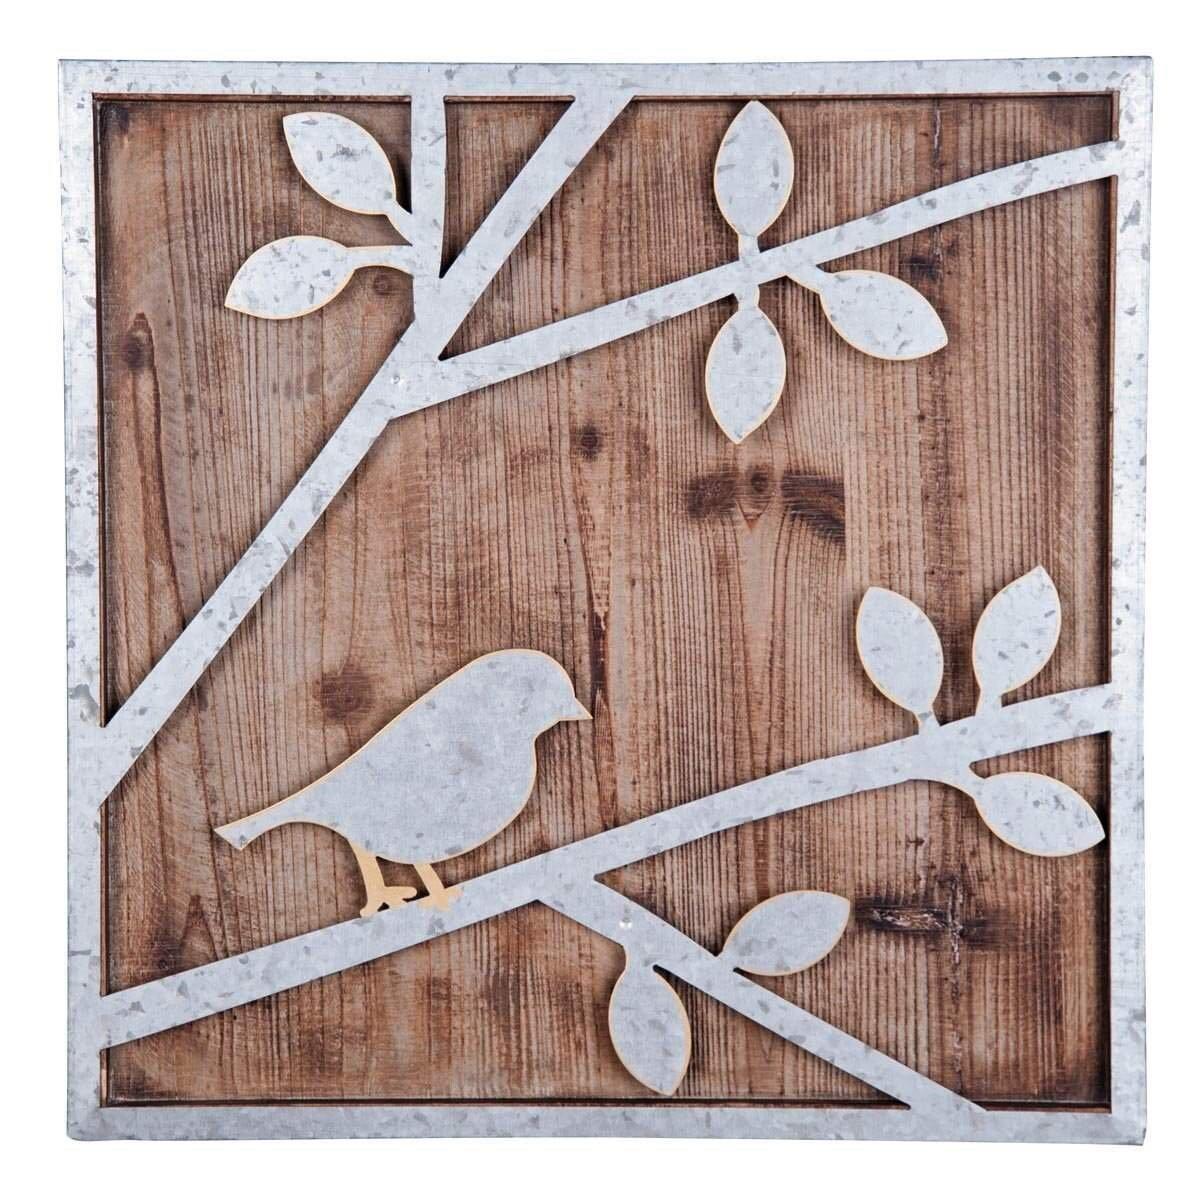 Amazon.com: Foreside Home and Garden Square Tweet Bird Wall Art ...